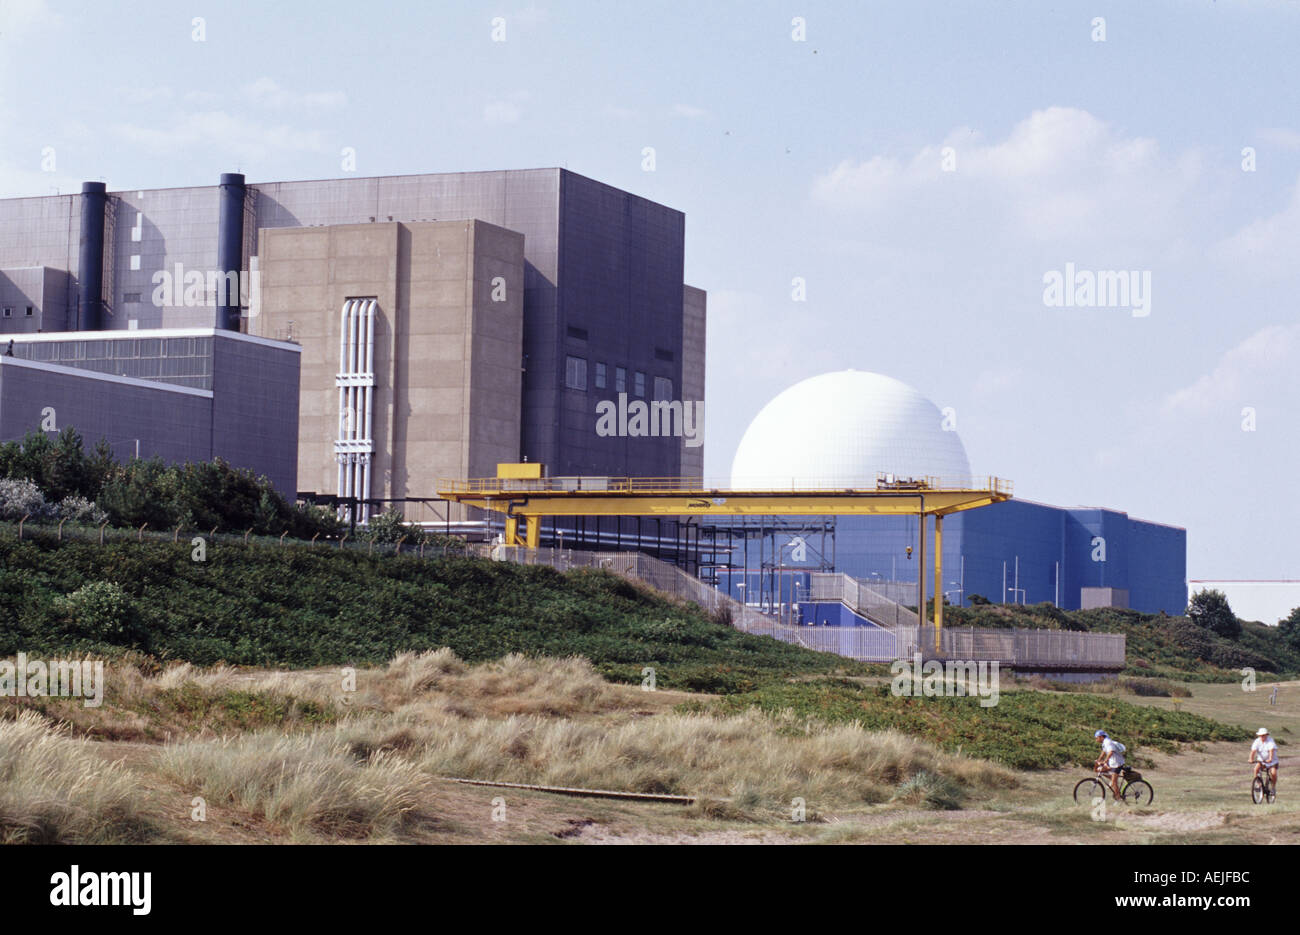 Sizewell A and B nuclear power stations, Sizewell near Lieston, Suffolk, UK. - Stock Image